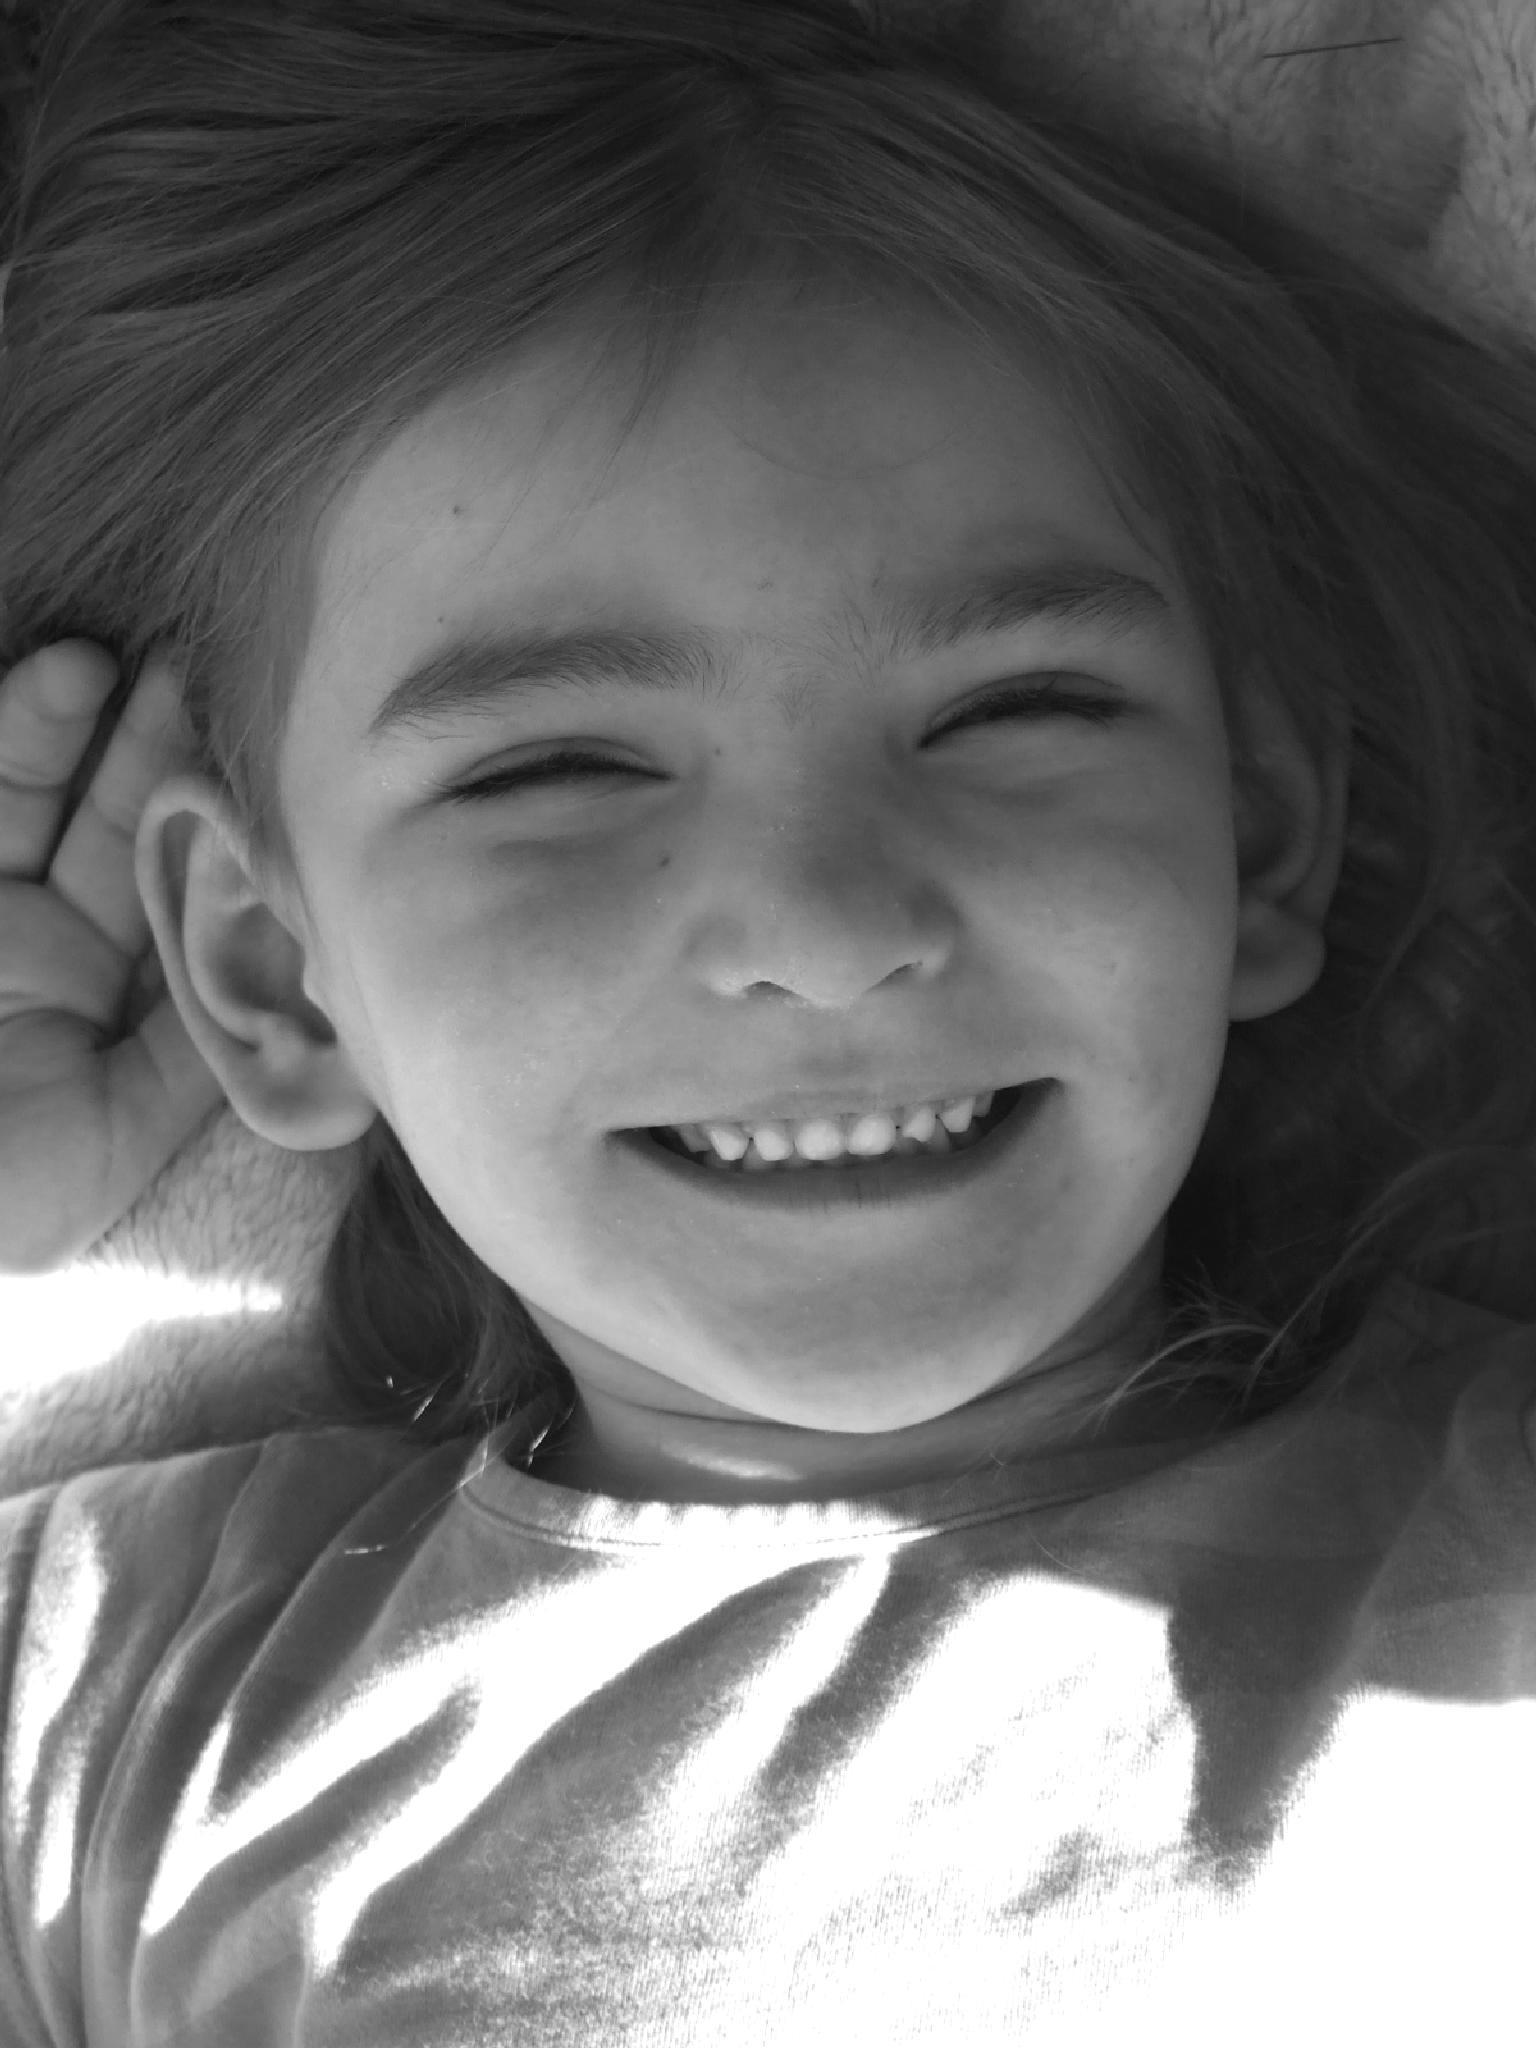 miss poser daughter  by gillian.burden